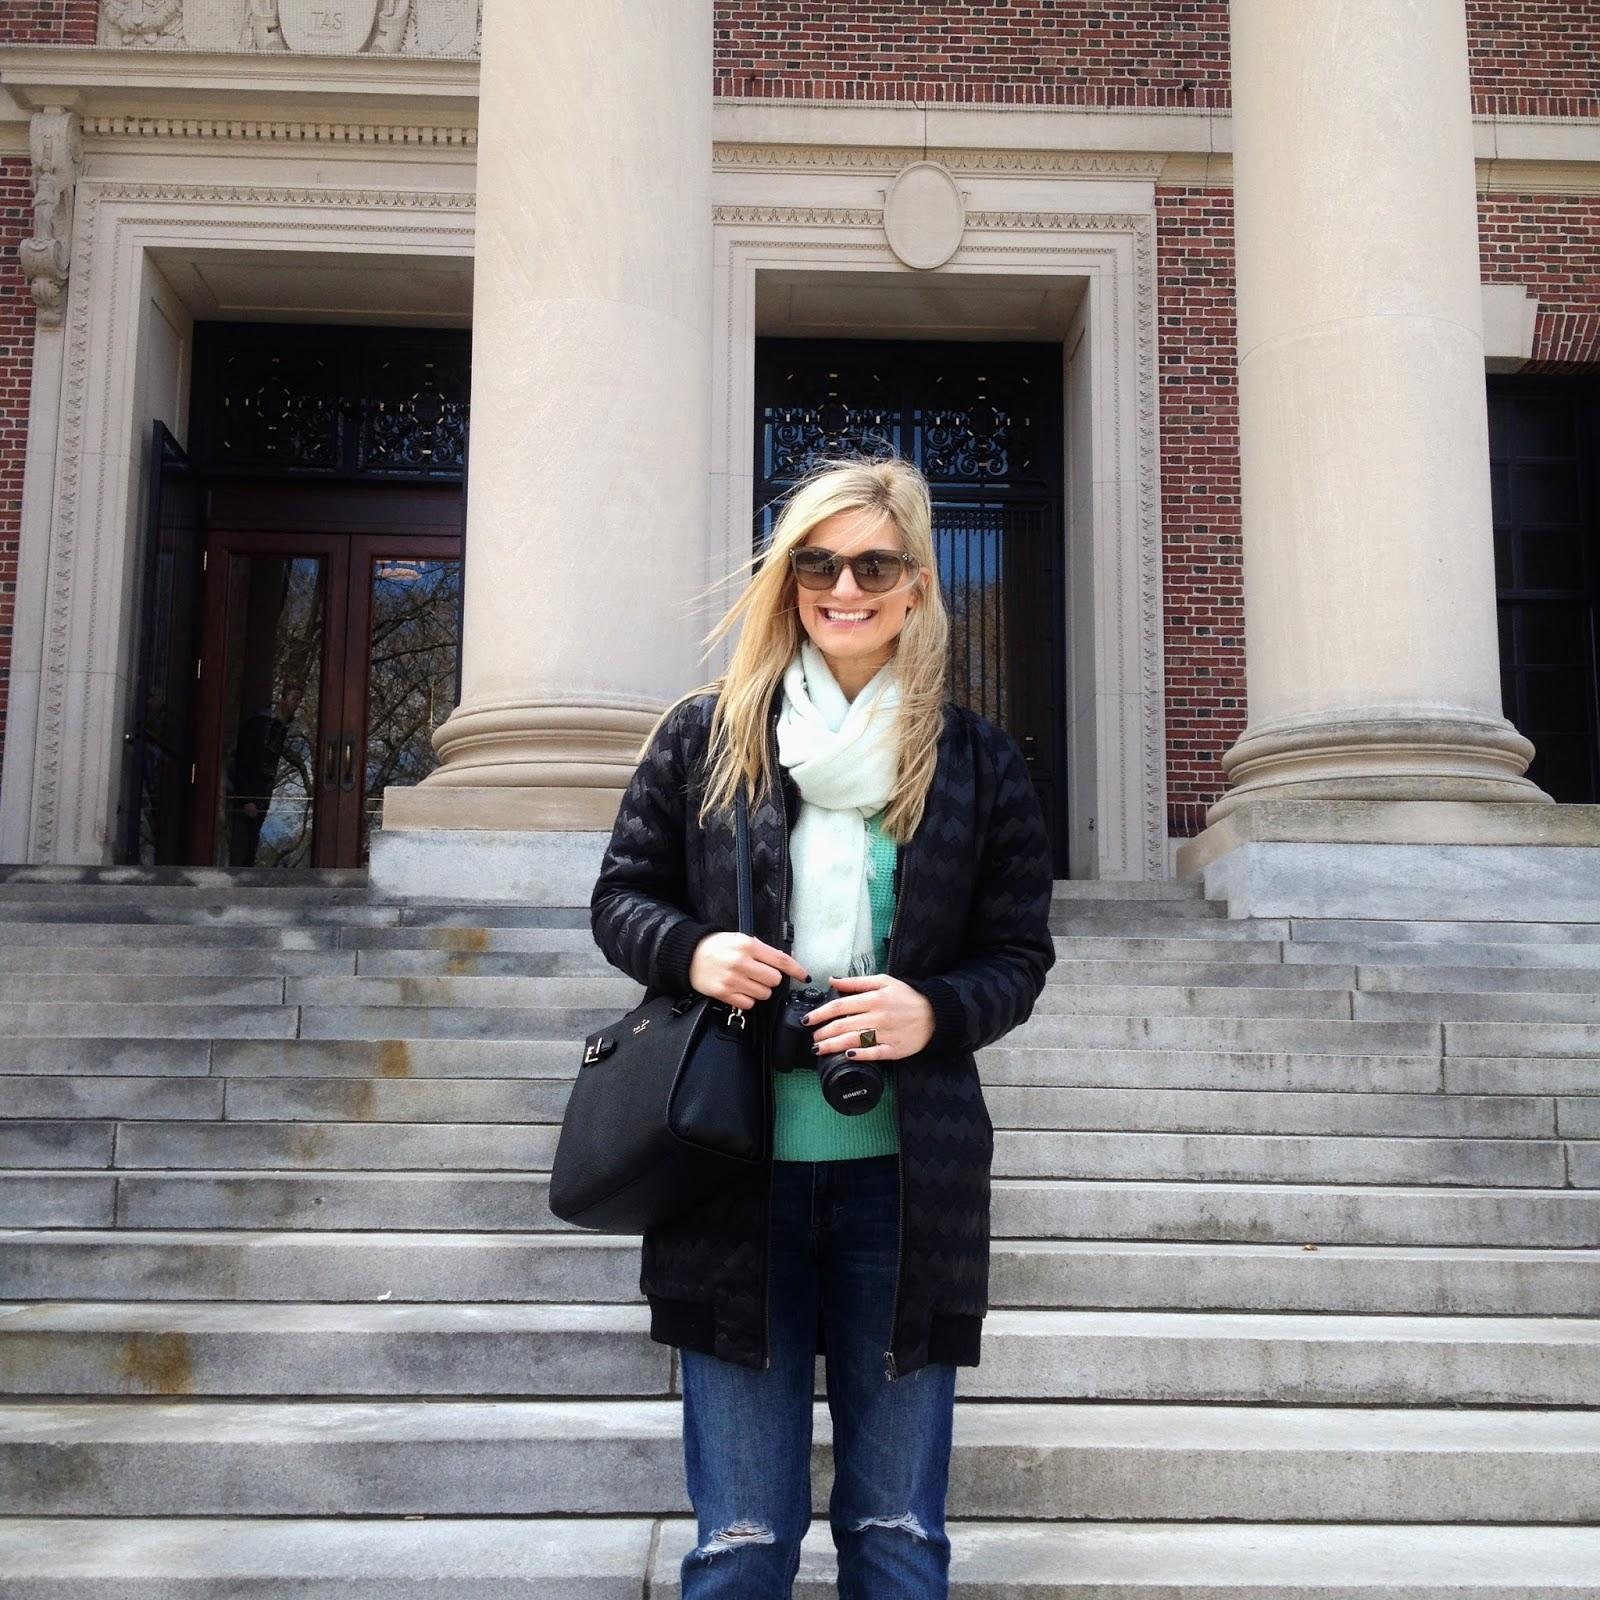 bijuleni - Harvard Library